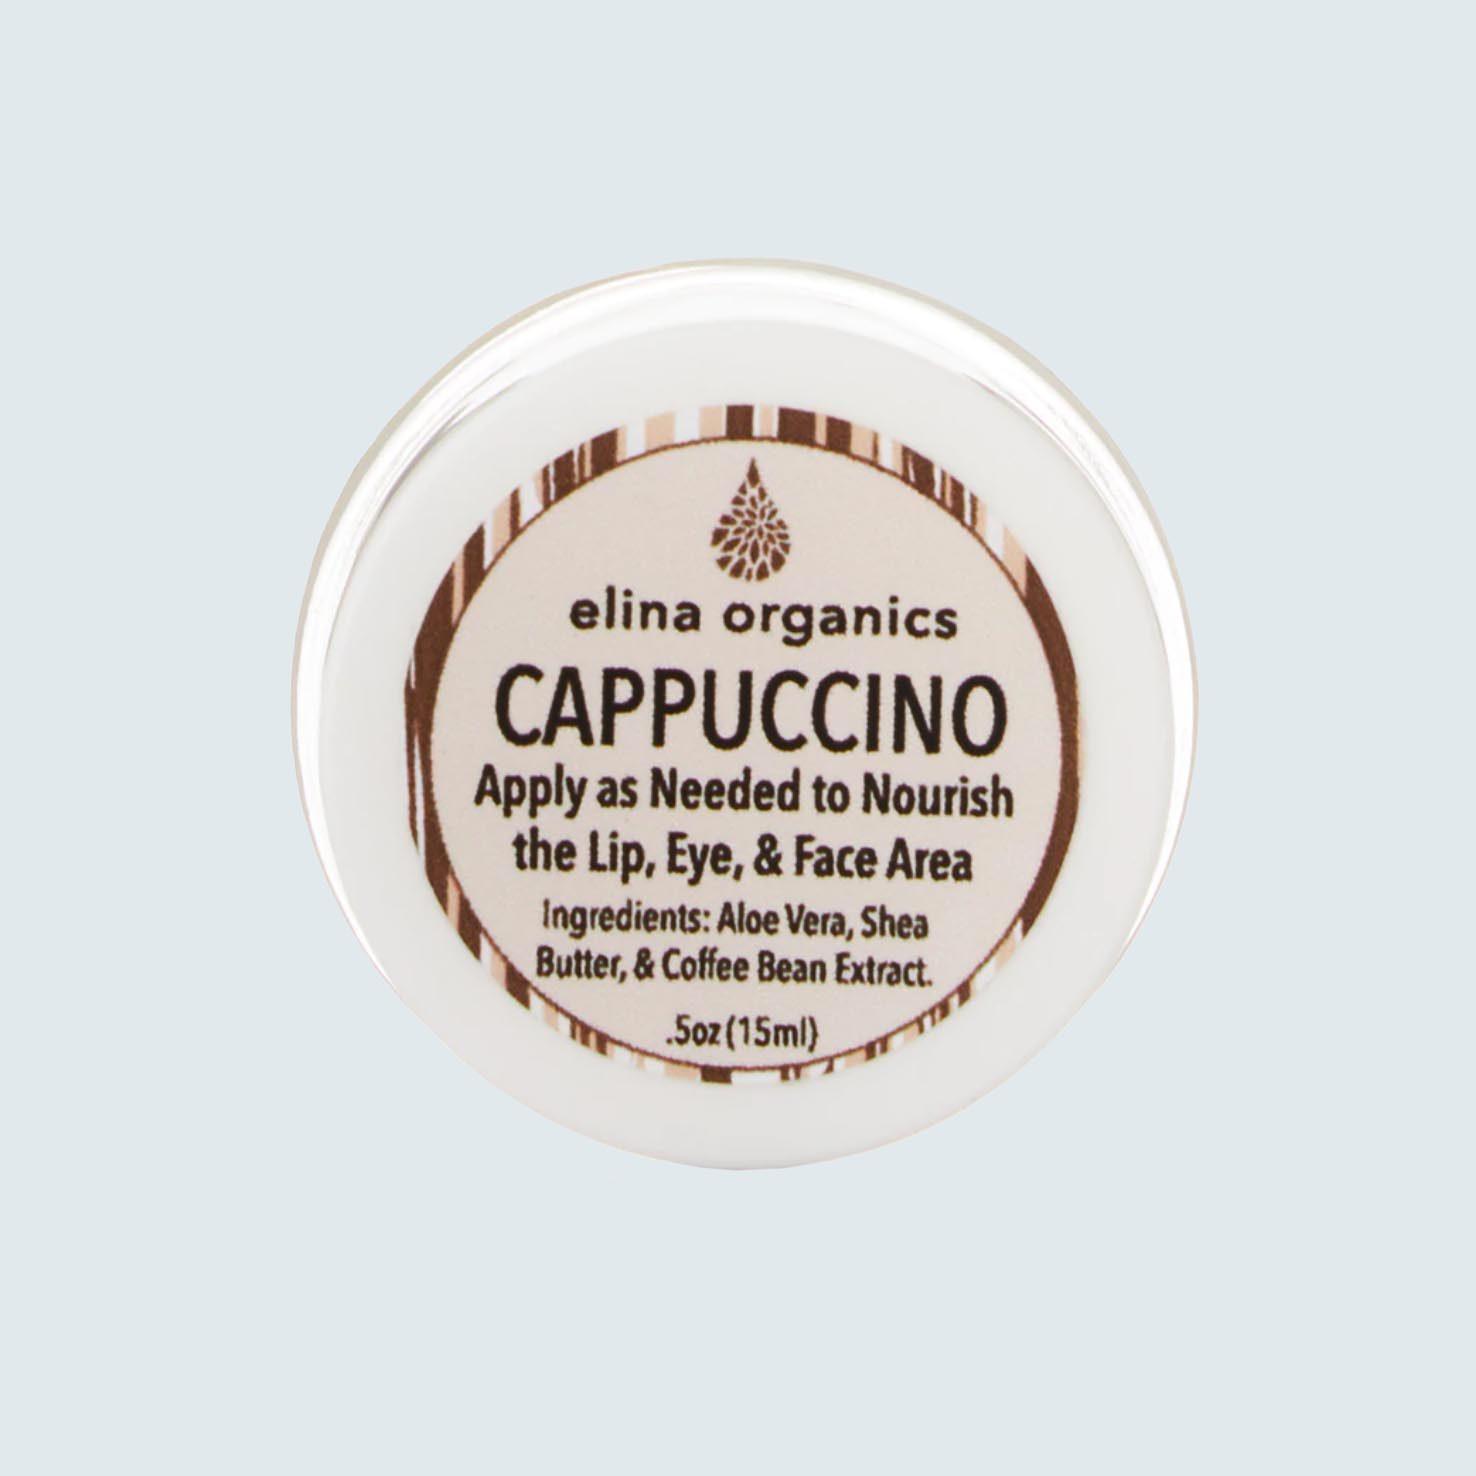 Elina Organics Cappuccino Balm